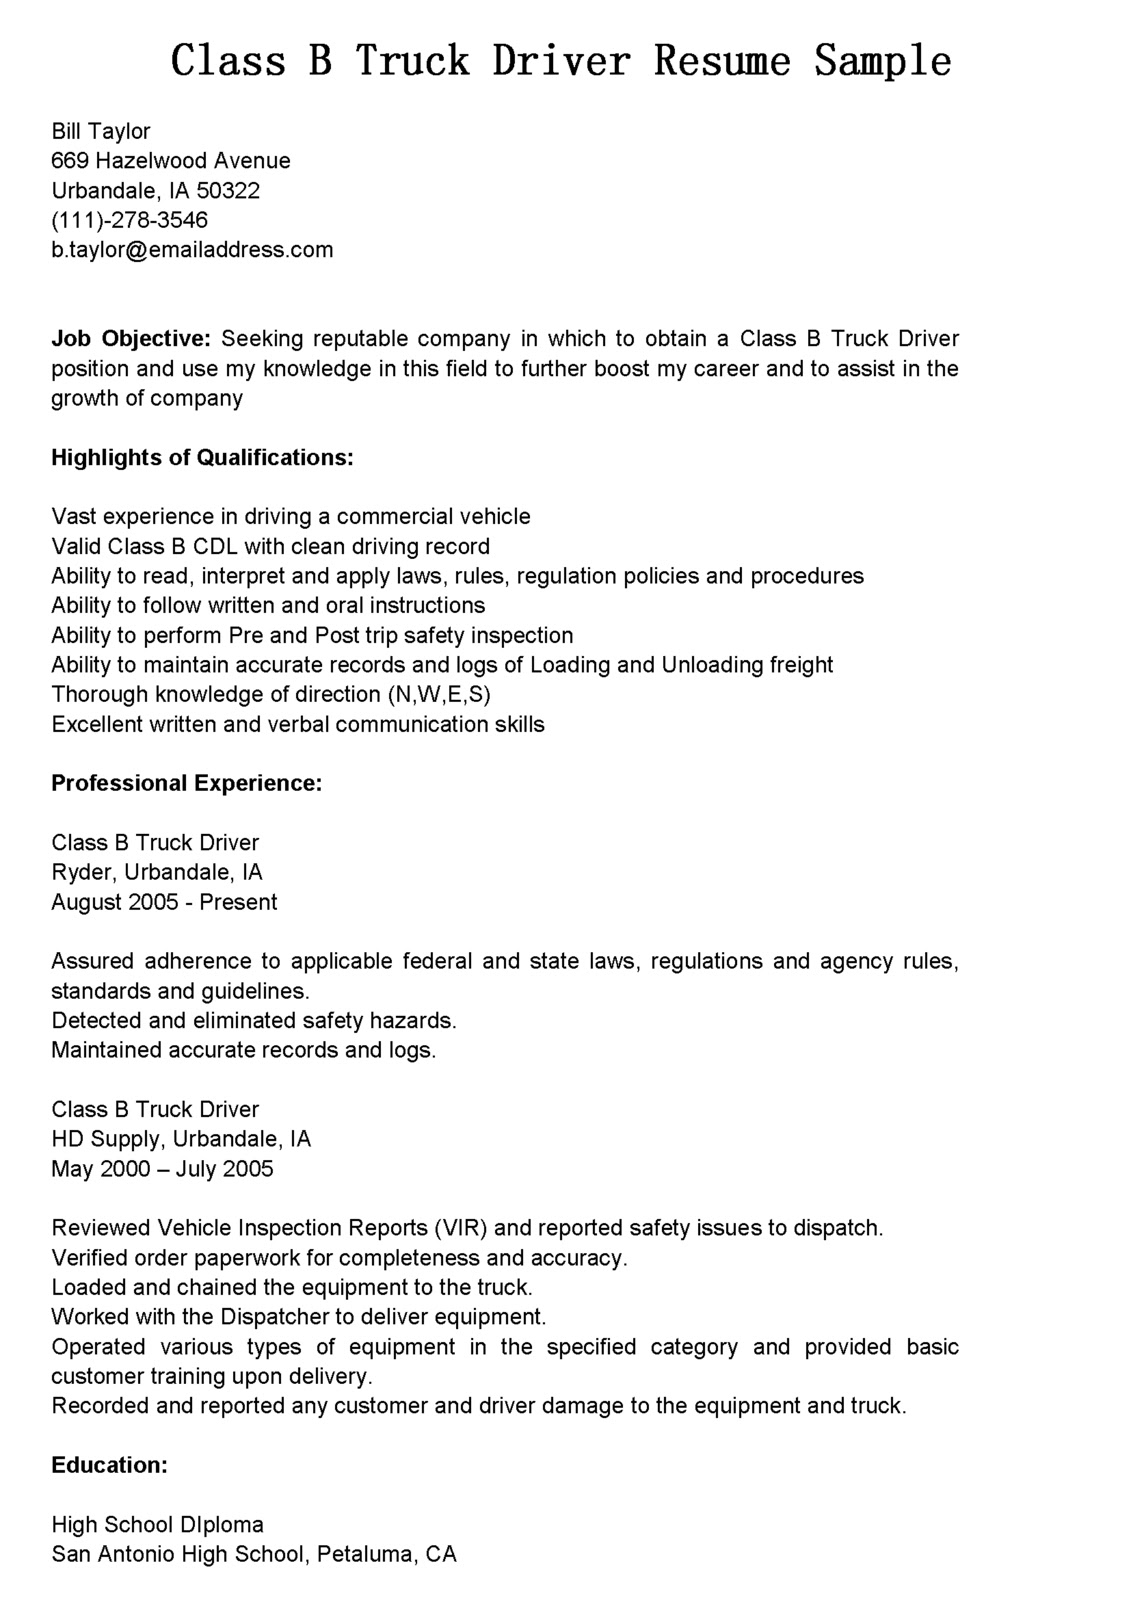 Resume Esthetician Position Class B Truck Driver Resume Sample  19388  Resume For Esthetician